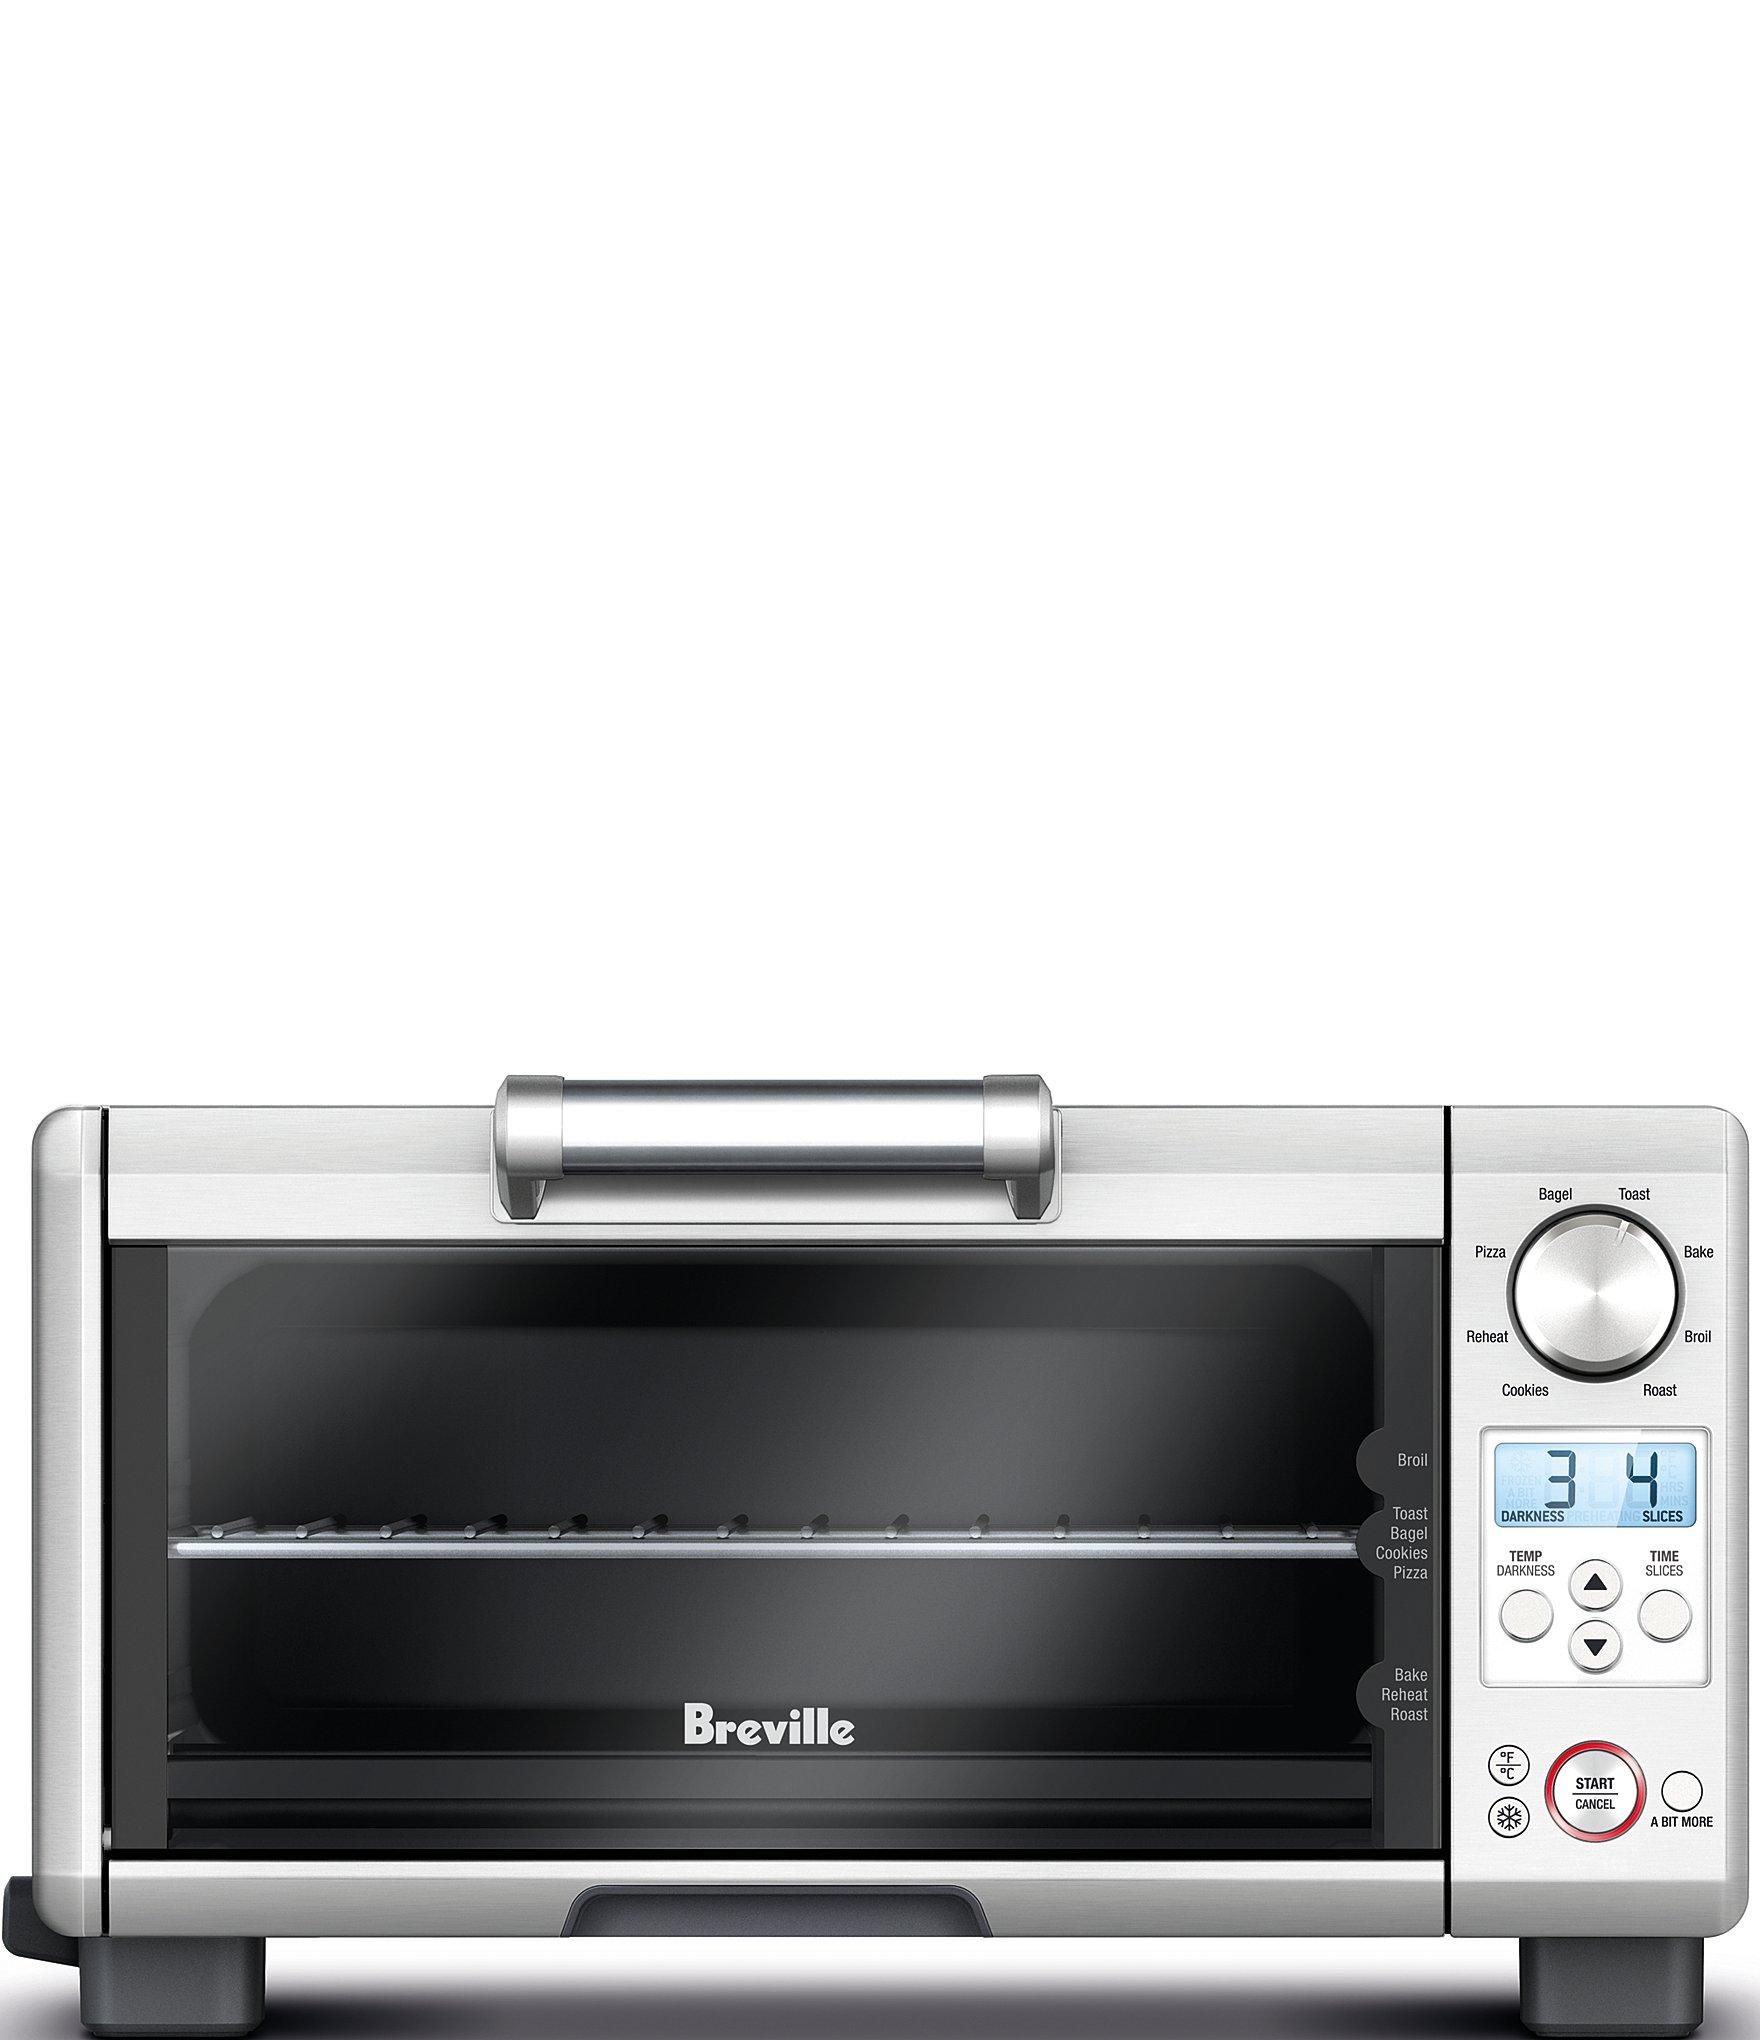 Home | Kitchen | Small Appliances | Toasters \u0026 Ovens | Dillards.com